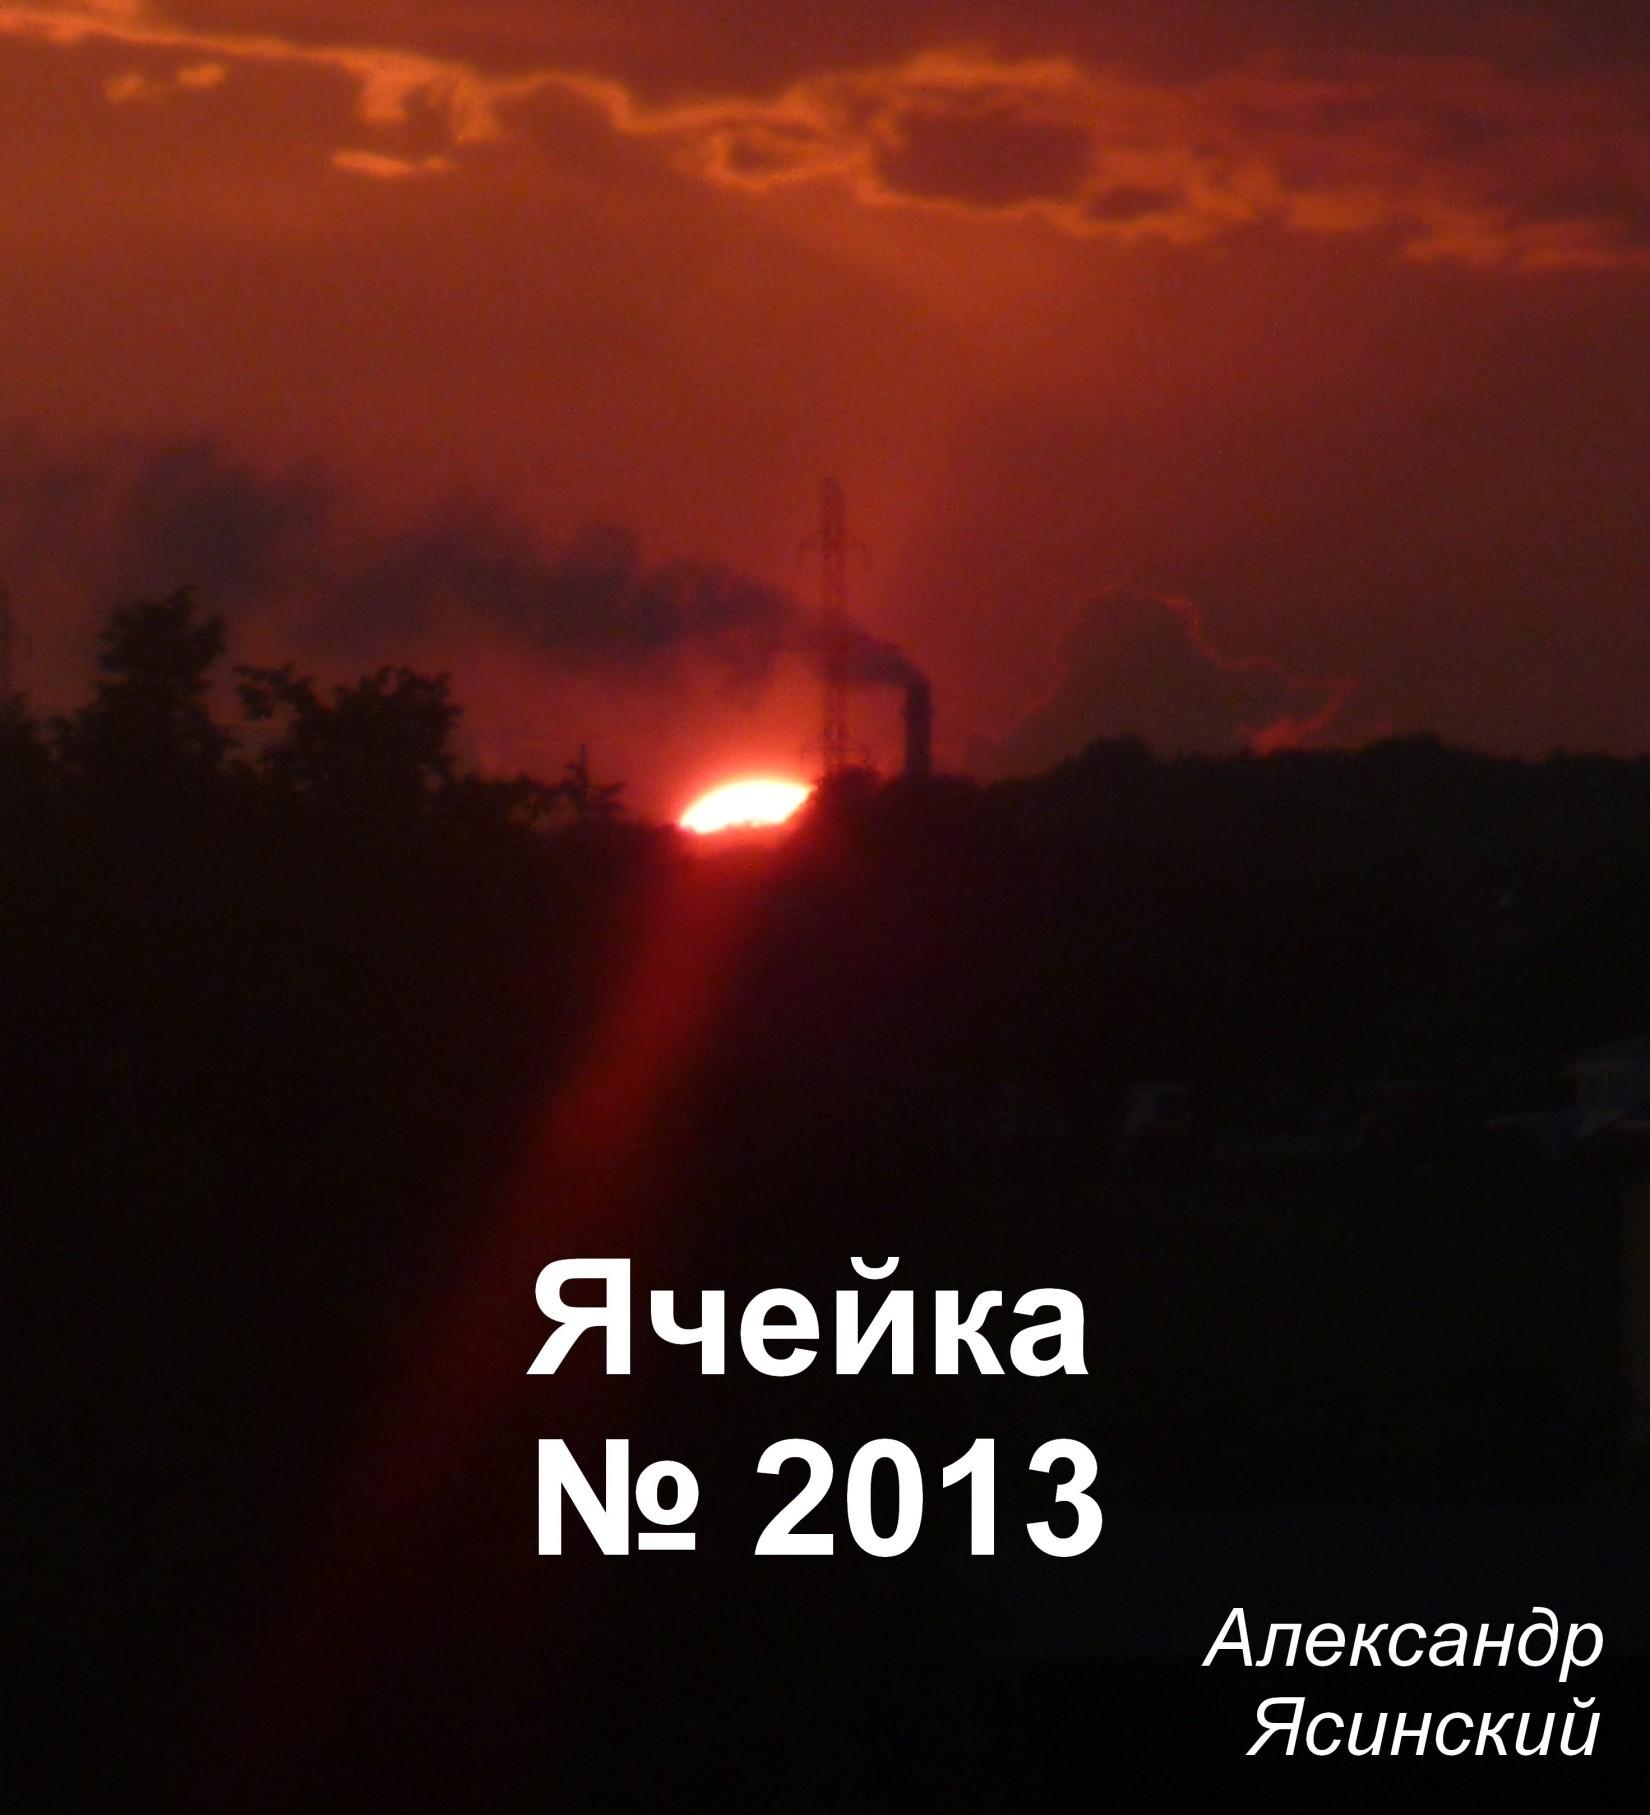 Александр Сергеевич Ясинский Ячейка №2013